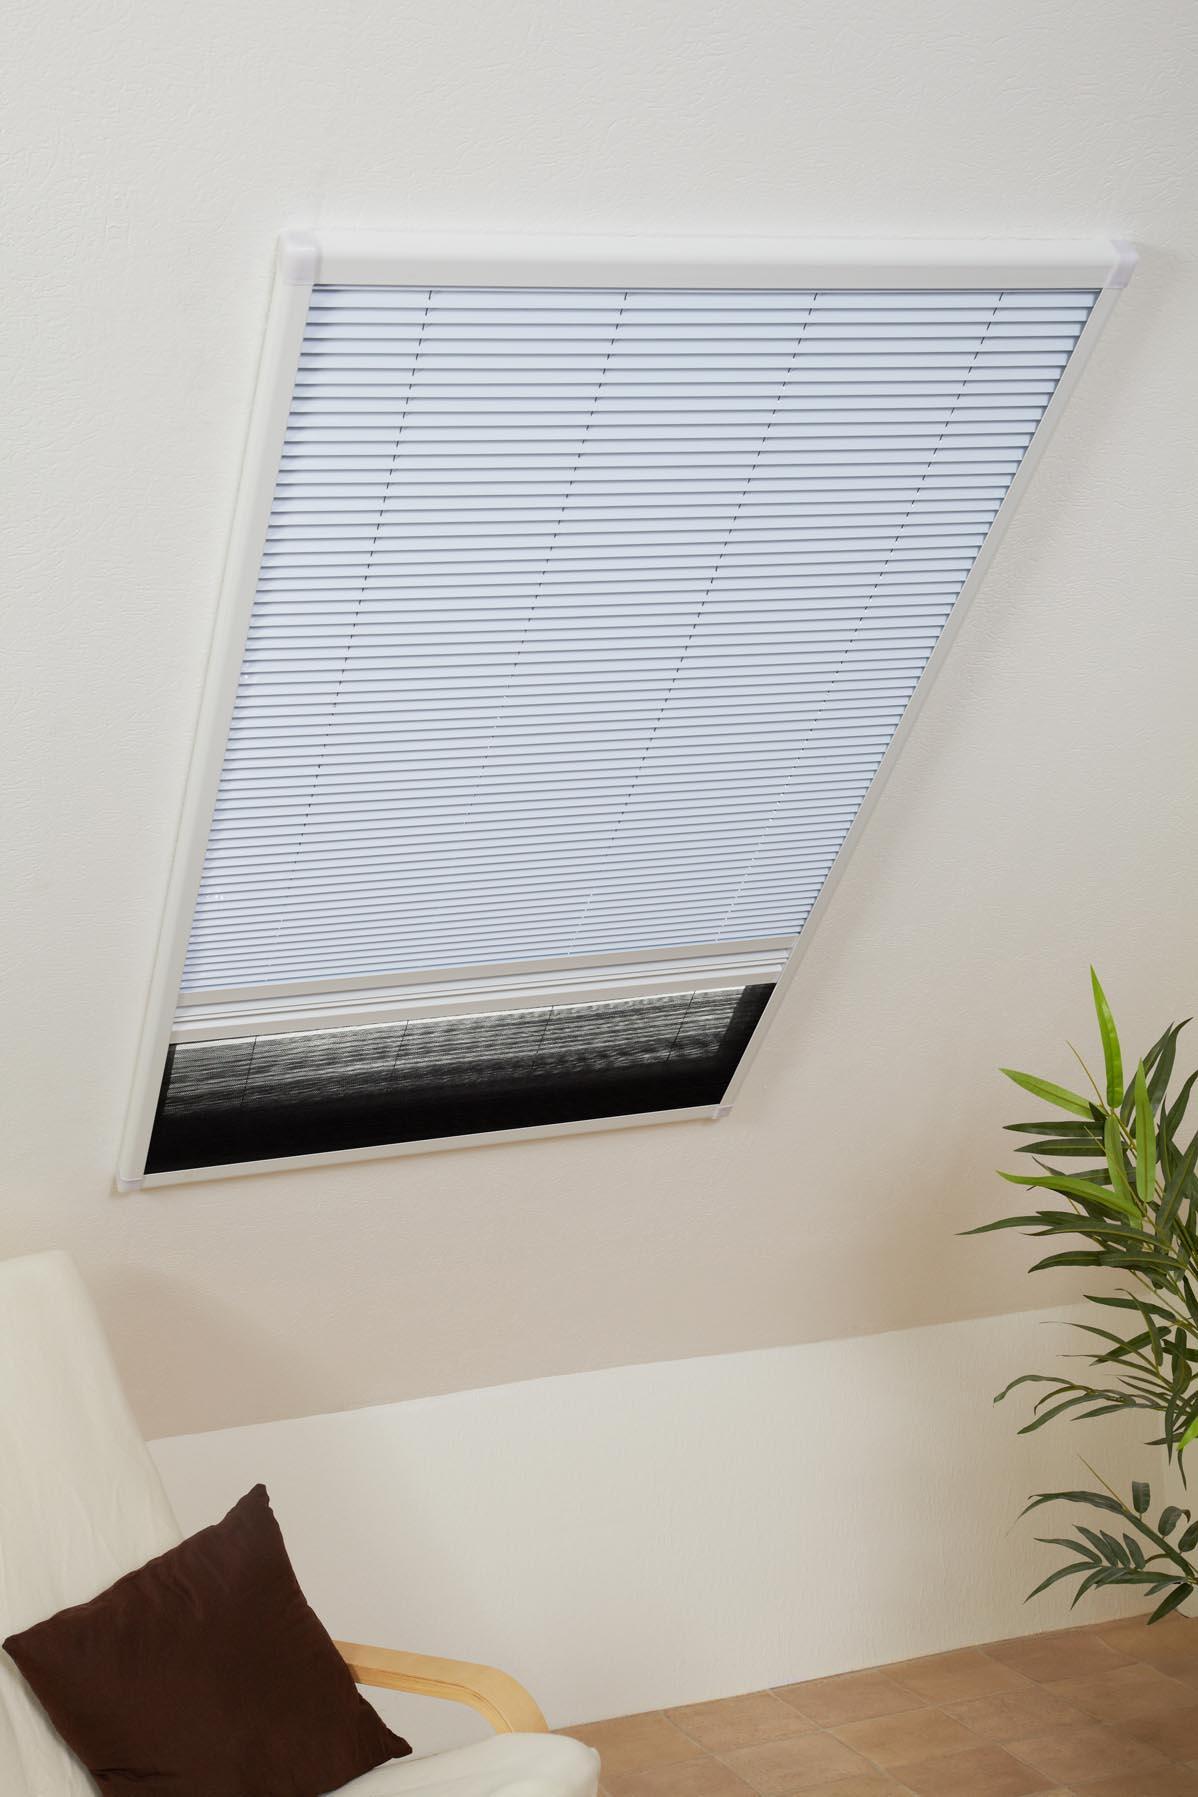 kombi dachfenster plissee sonnenschutz fliegengitter gaze insektenschutz top ebay. Black Bedroom Furniture Sets. Home Design Ideas